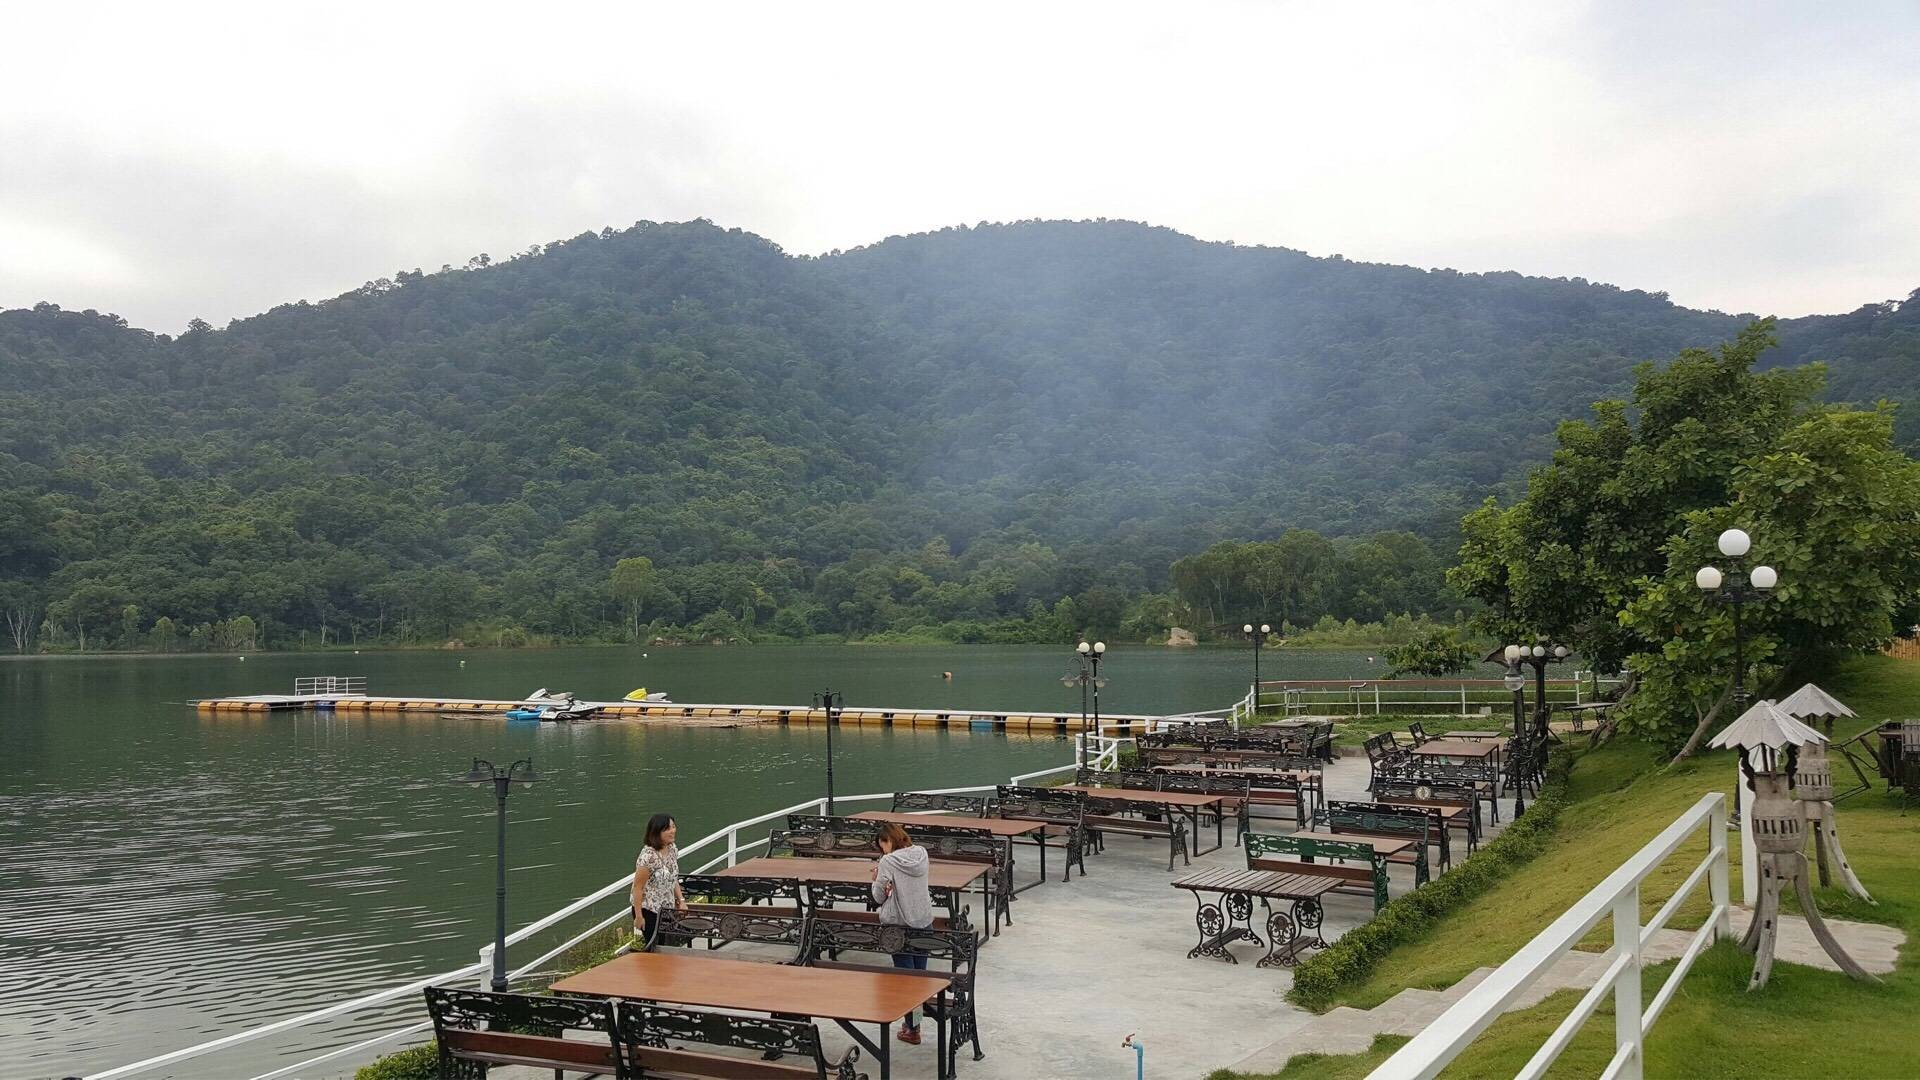 Chonburi Mountain